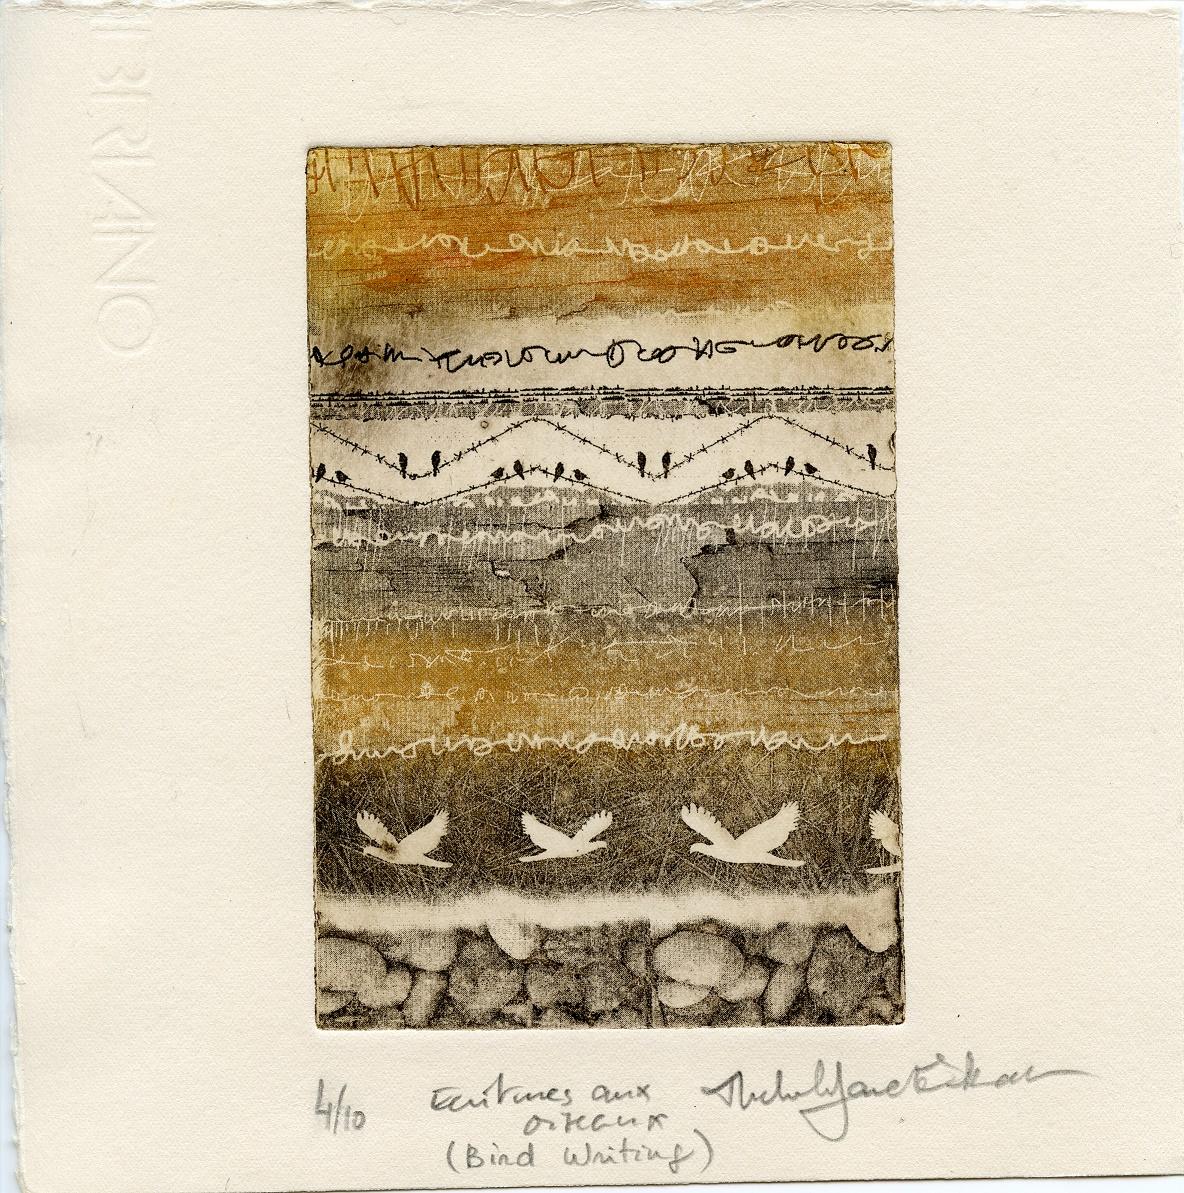 James, Michele: Bird Writing intagilio